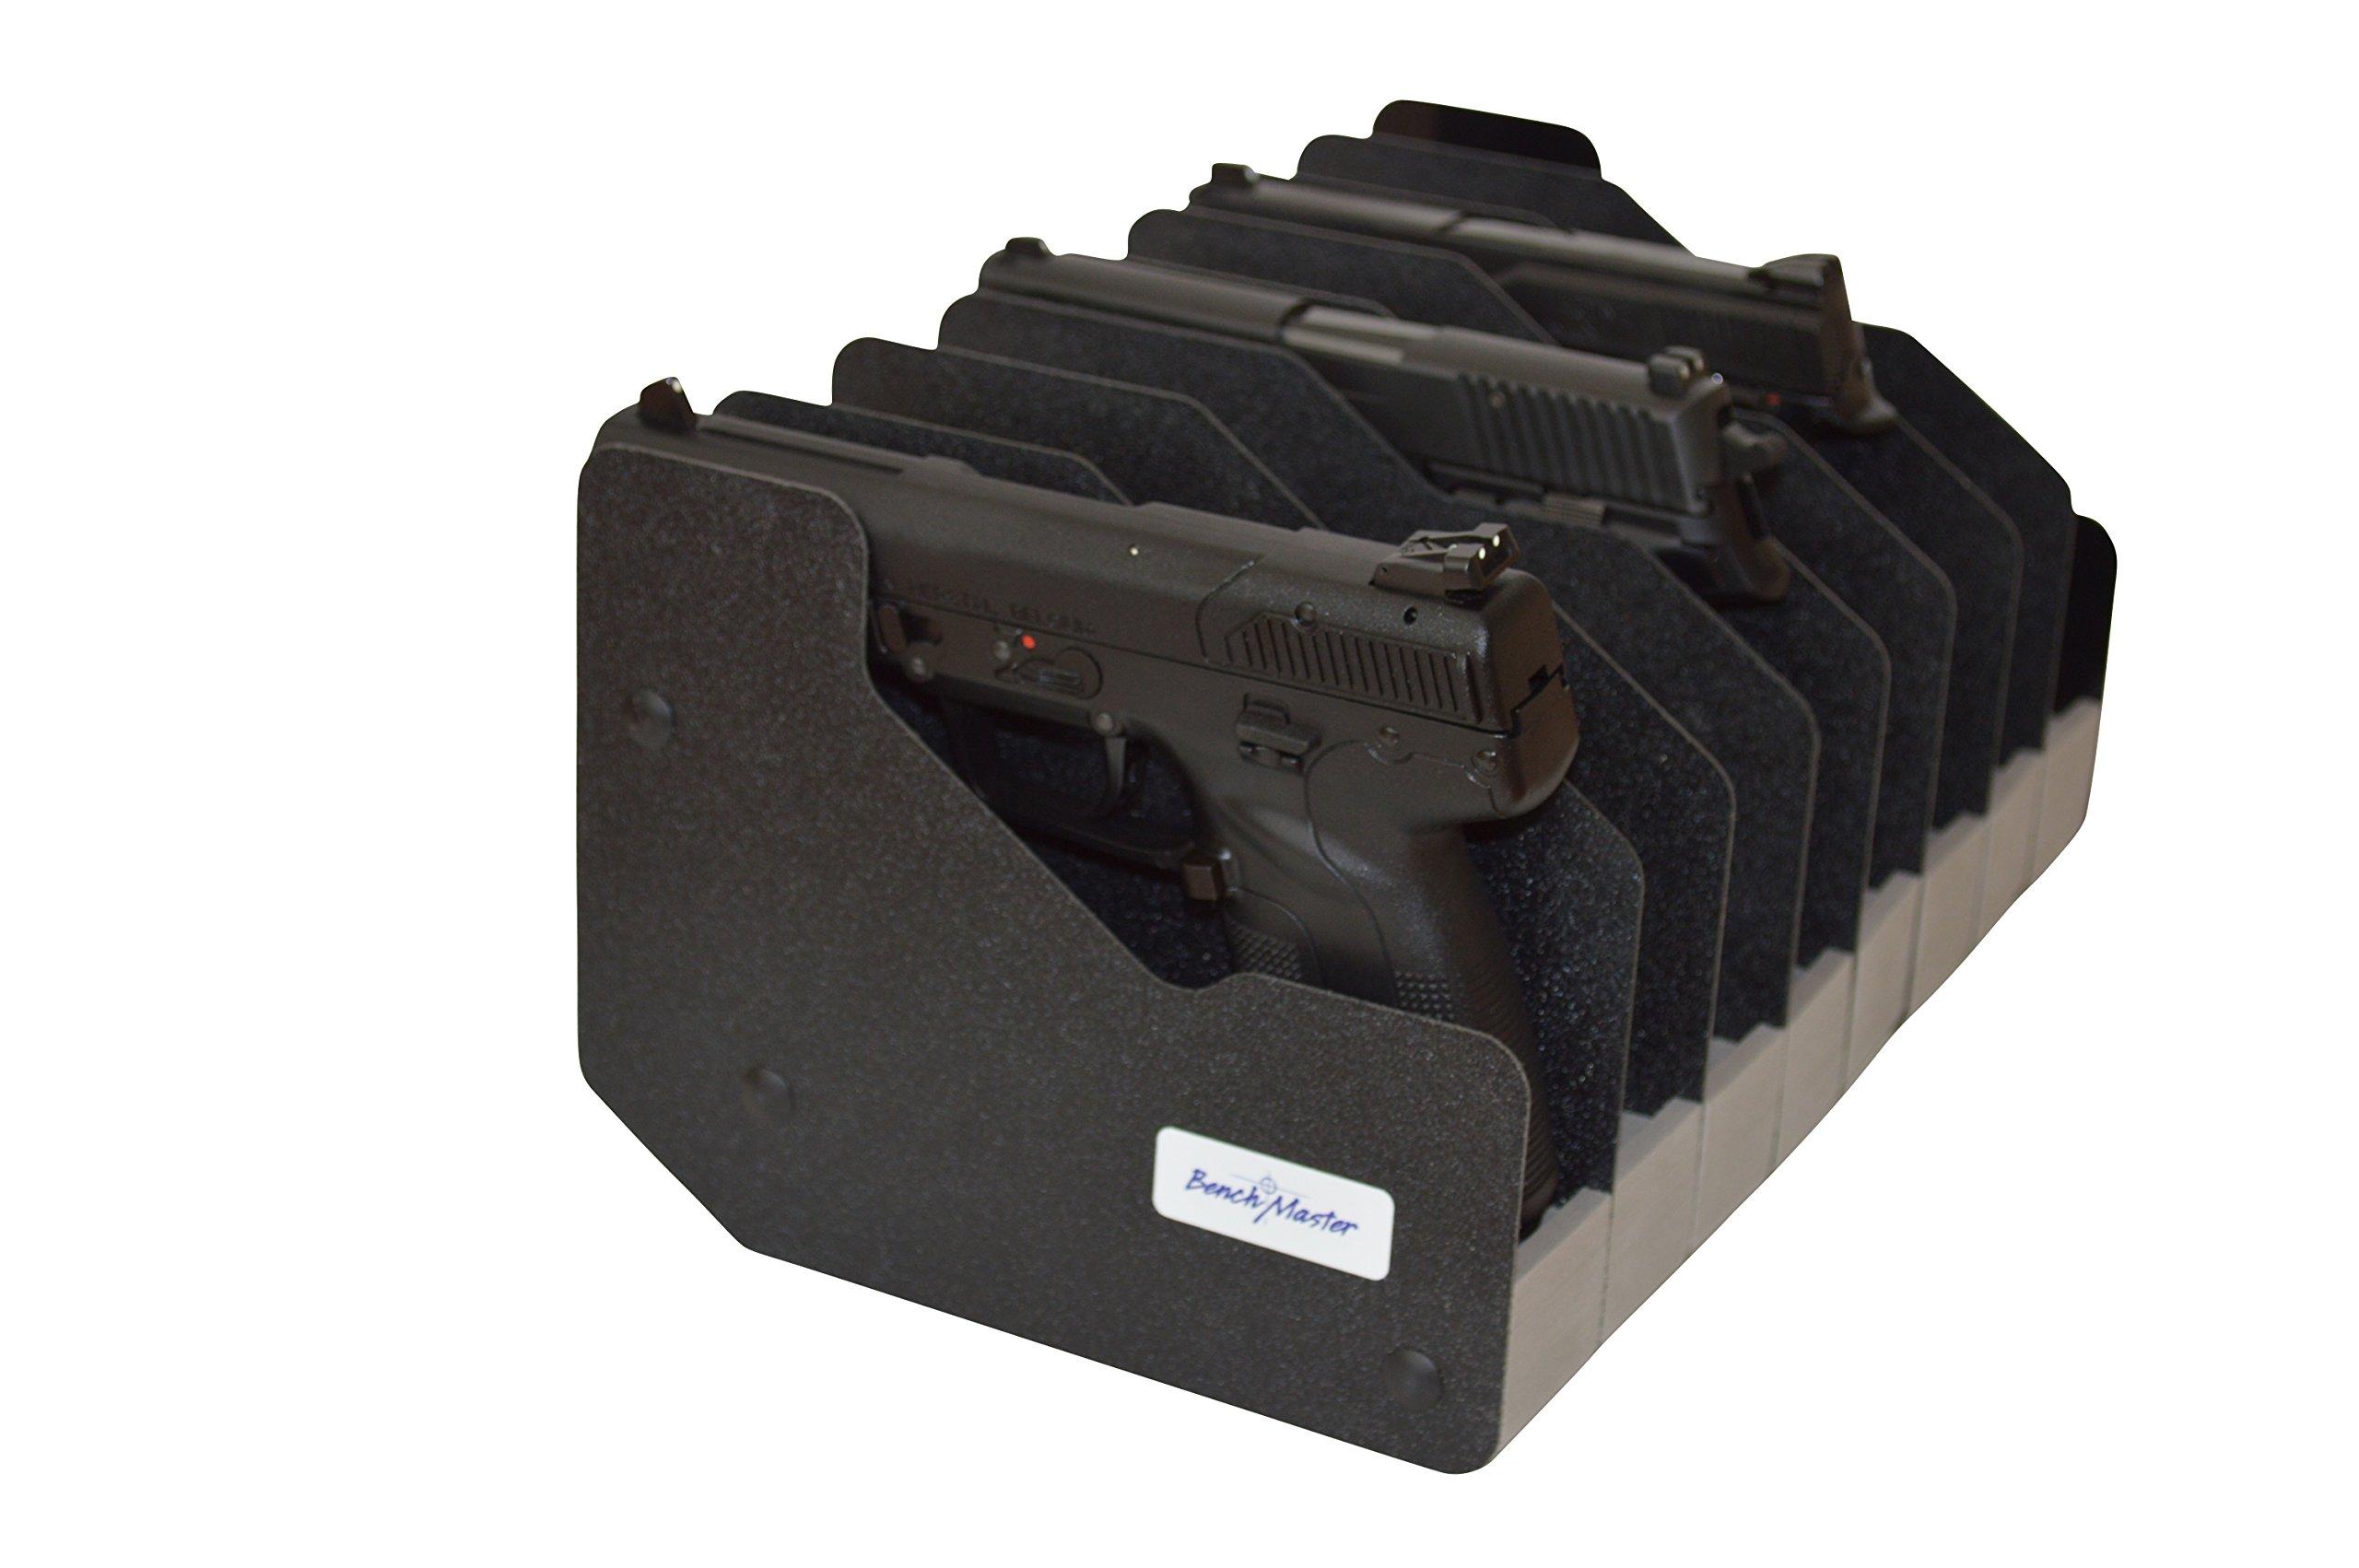 Benchmaster - Weapon Rack - Twelve (12)  Gun Pistol Rack - Gun Safe Storage Accessories - Gun Rack